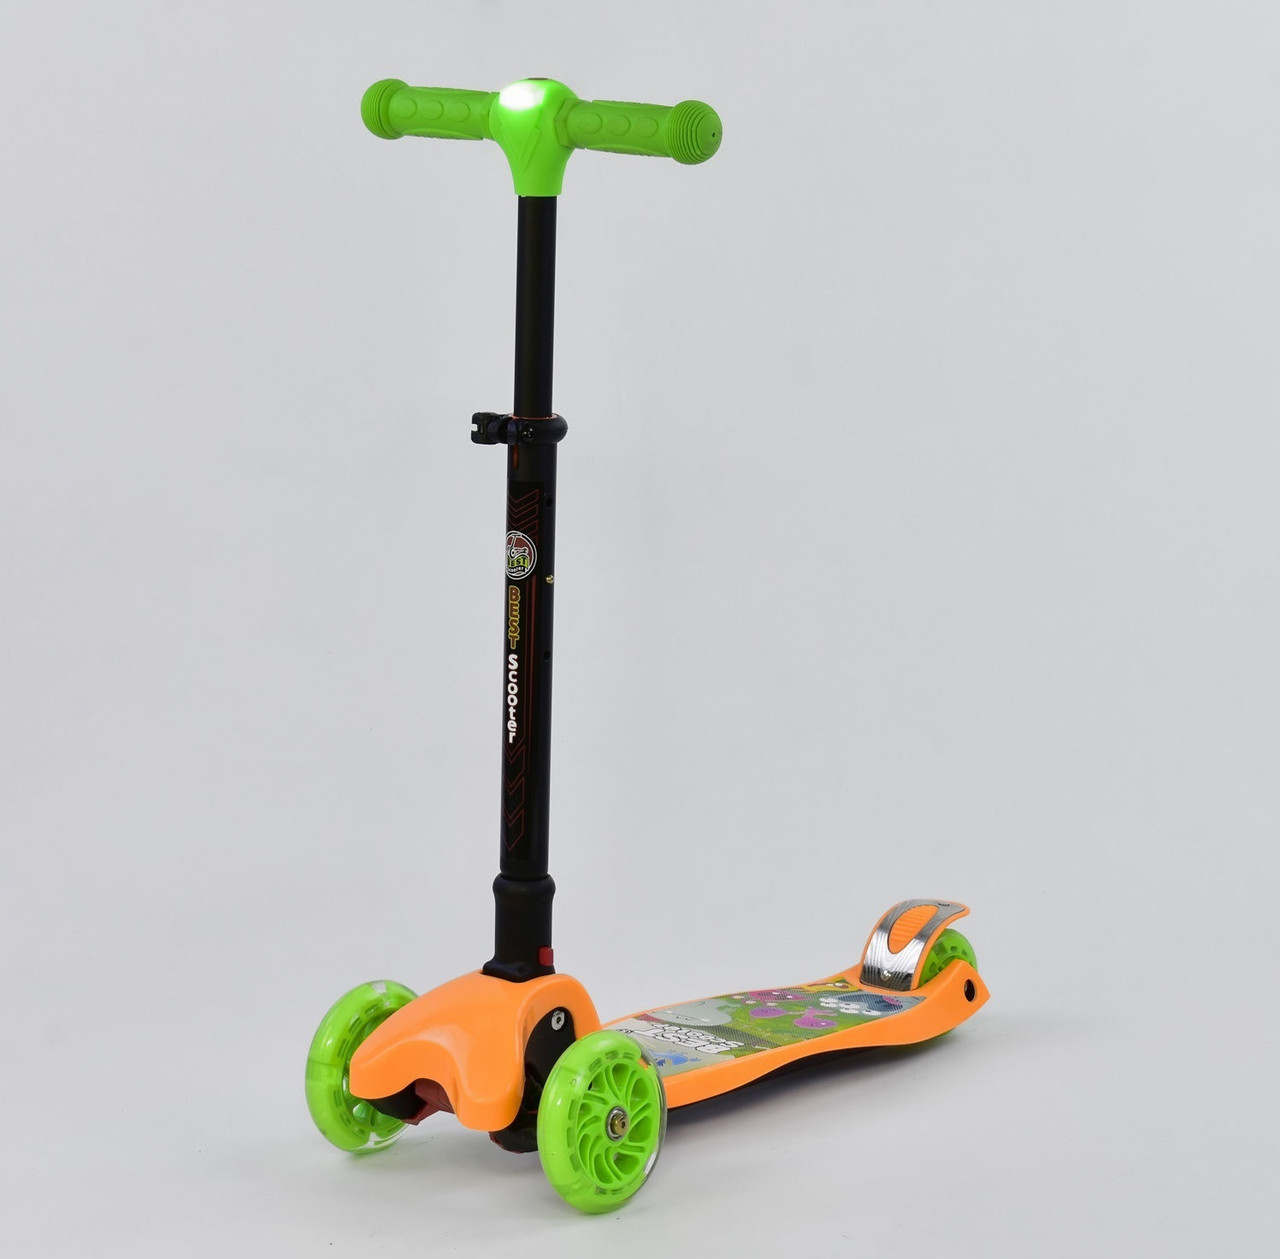 Best Scooter Самокат Best Scooter Leadlight С 40100 Green / Orange (С 40100)